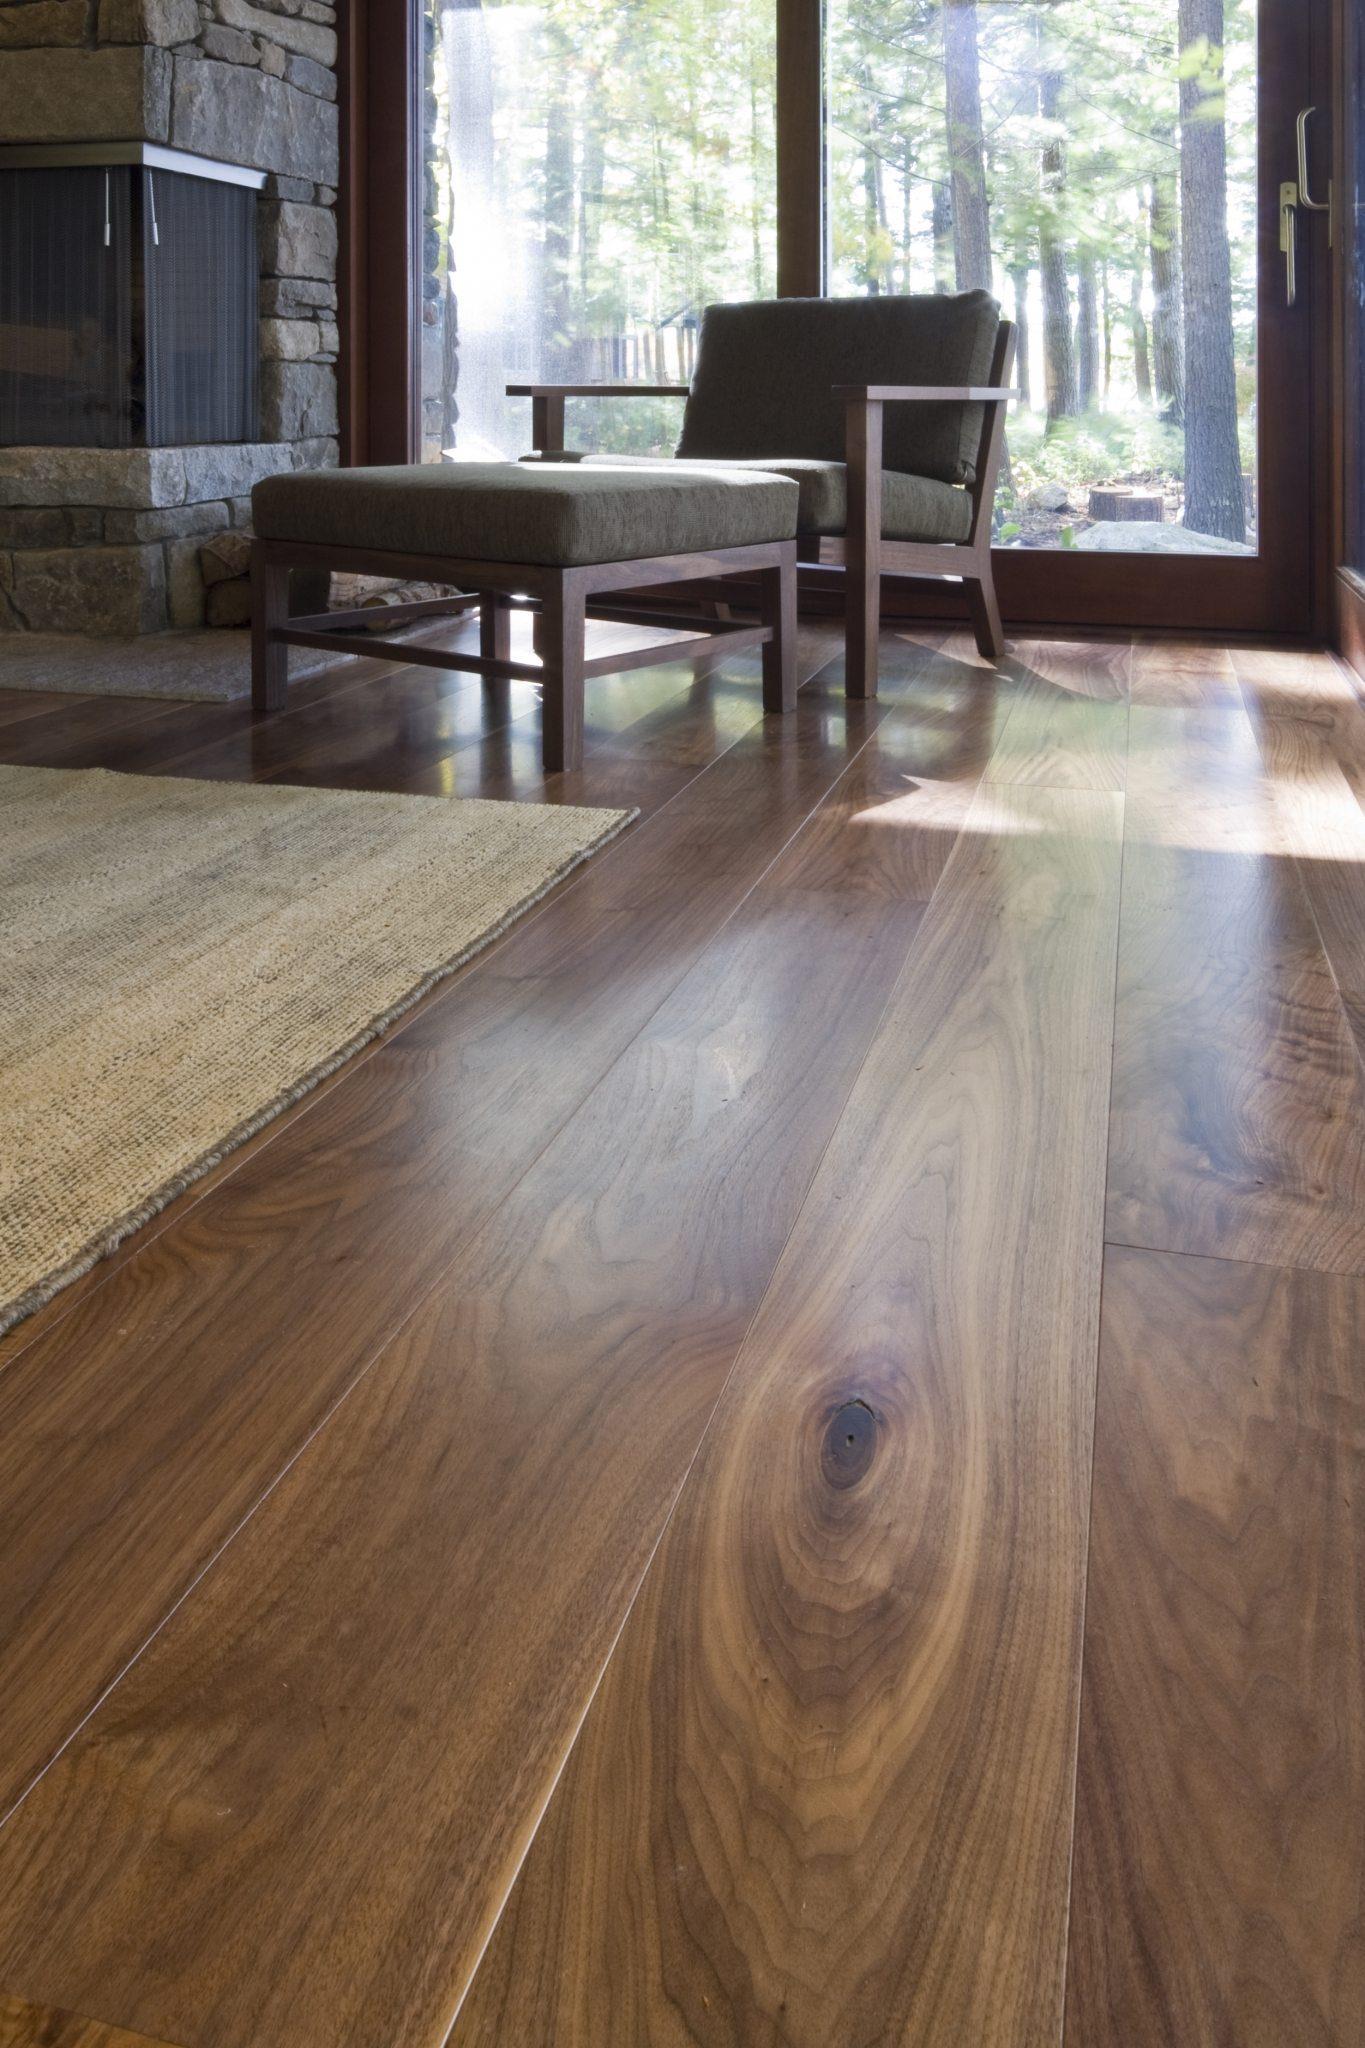 Walnut Flooring & Prefinished Wood FLooring from Carlisle Wide Plank Floors